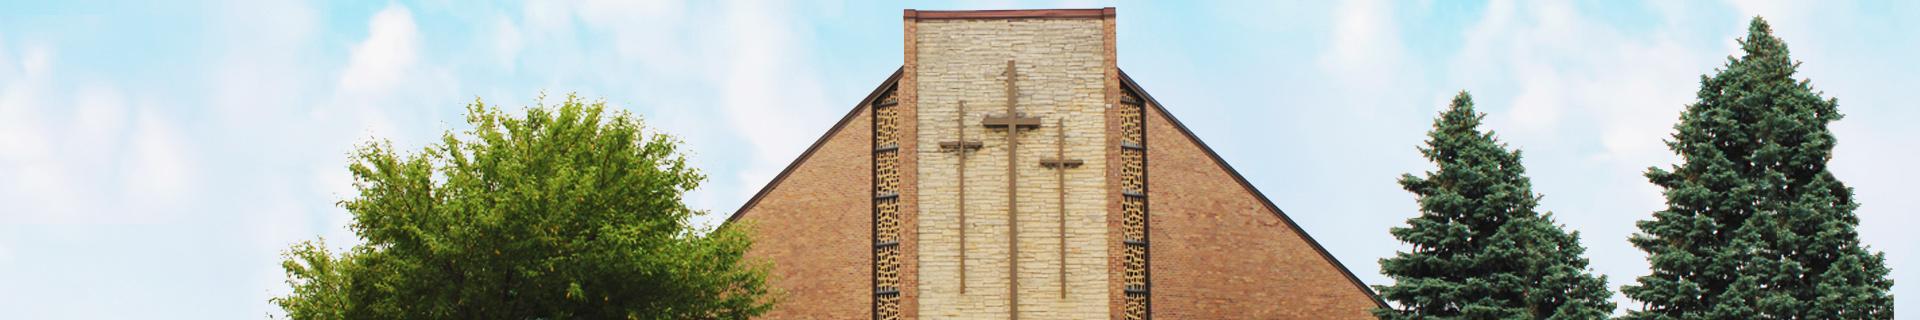 First Church United